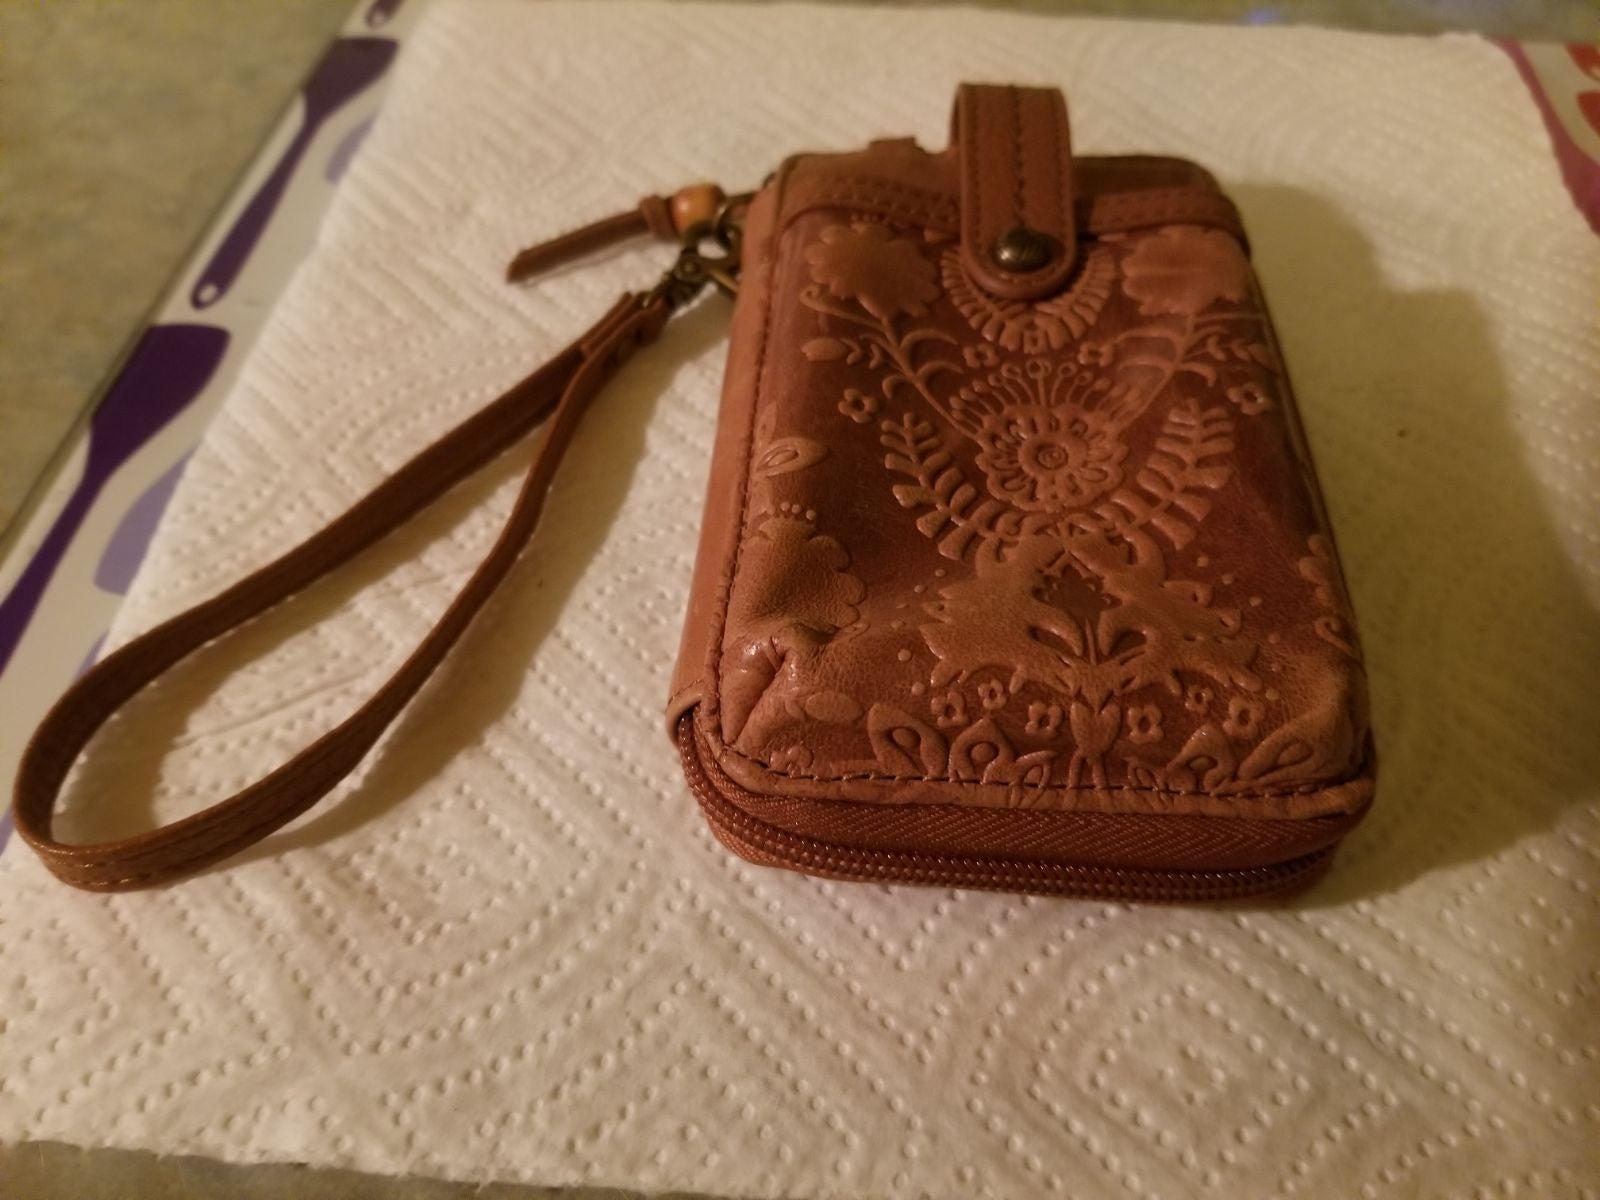 The Sak, leather smartphone wristlet